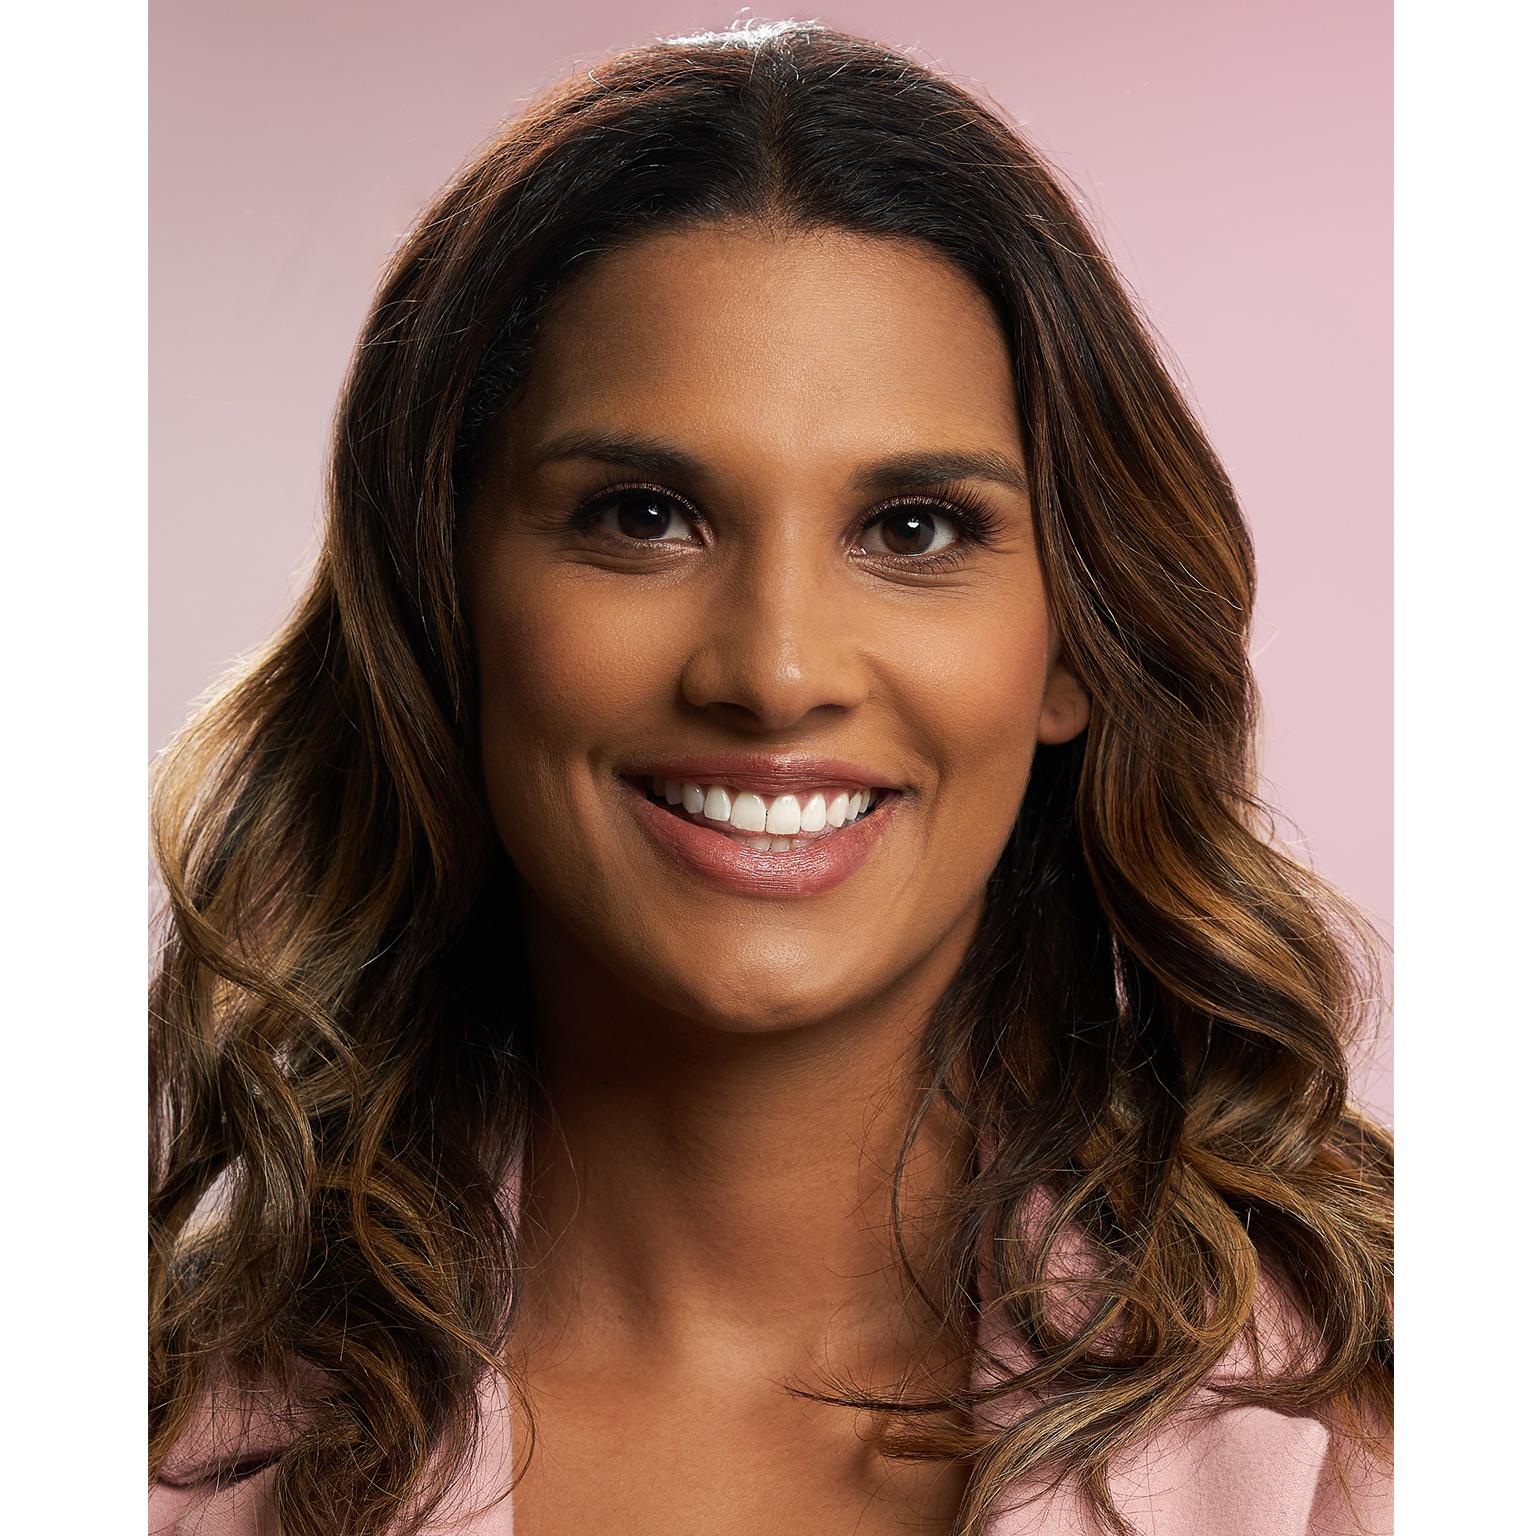 Toronto-Fitness-Model-Agency-Headshot-Lifestyle-Beauty-Portrait-Valerie-Saunders